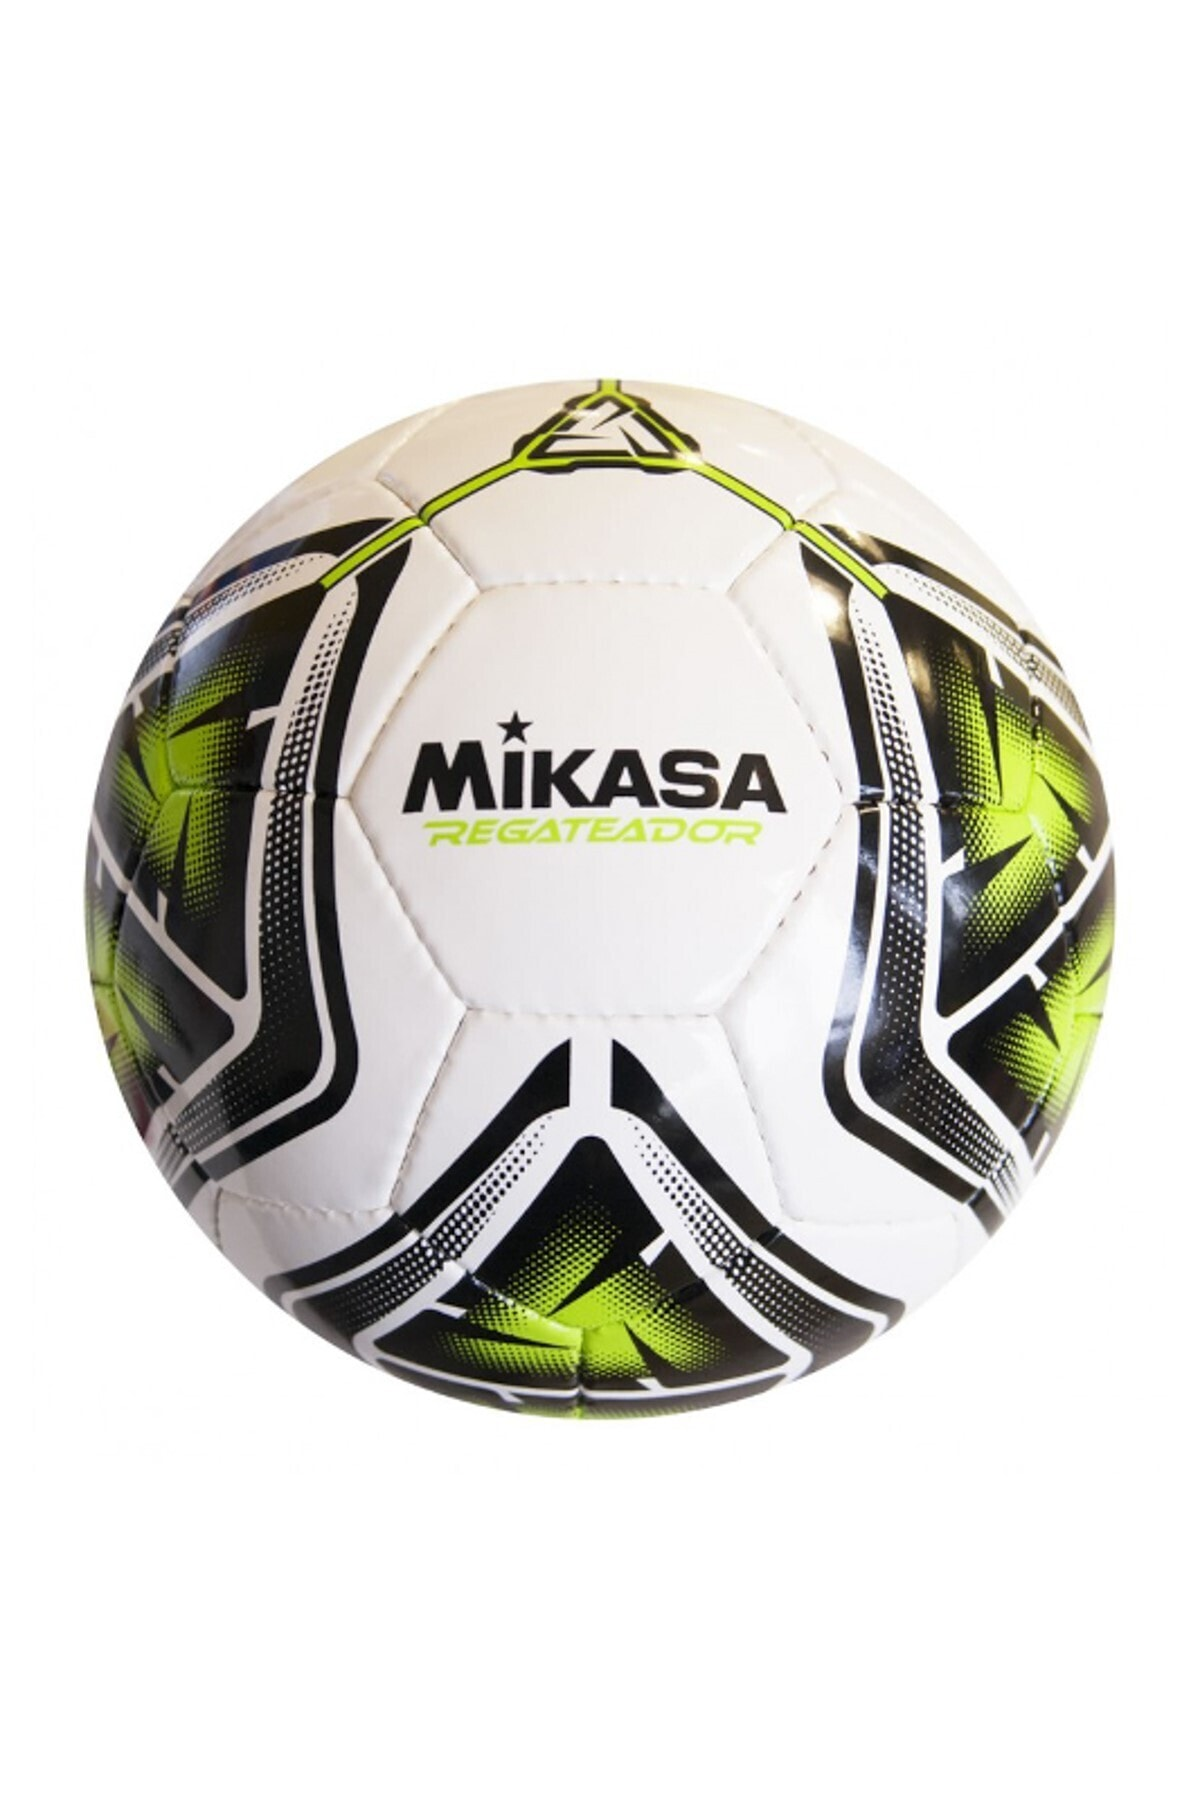 MIKASA Futbol Topu Regateador5-g Beyaz-yeşil - Topftbnnn065 1